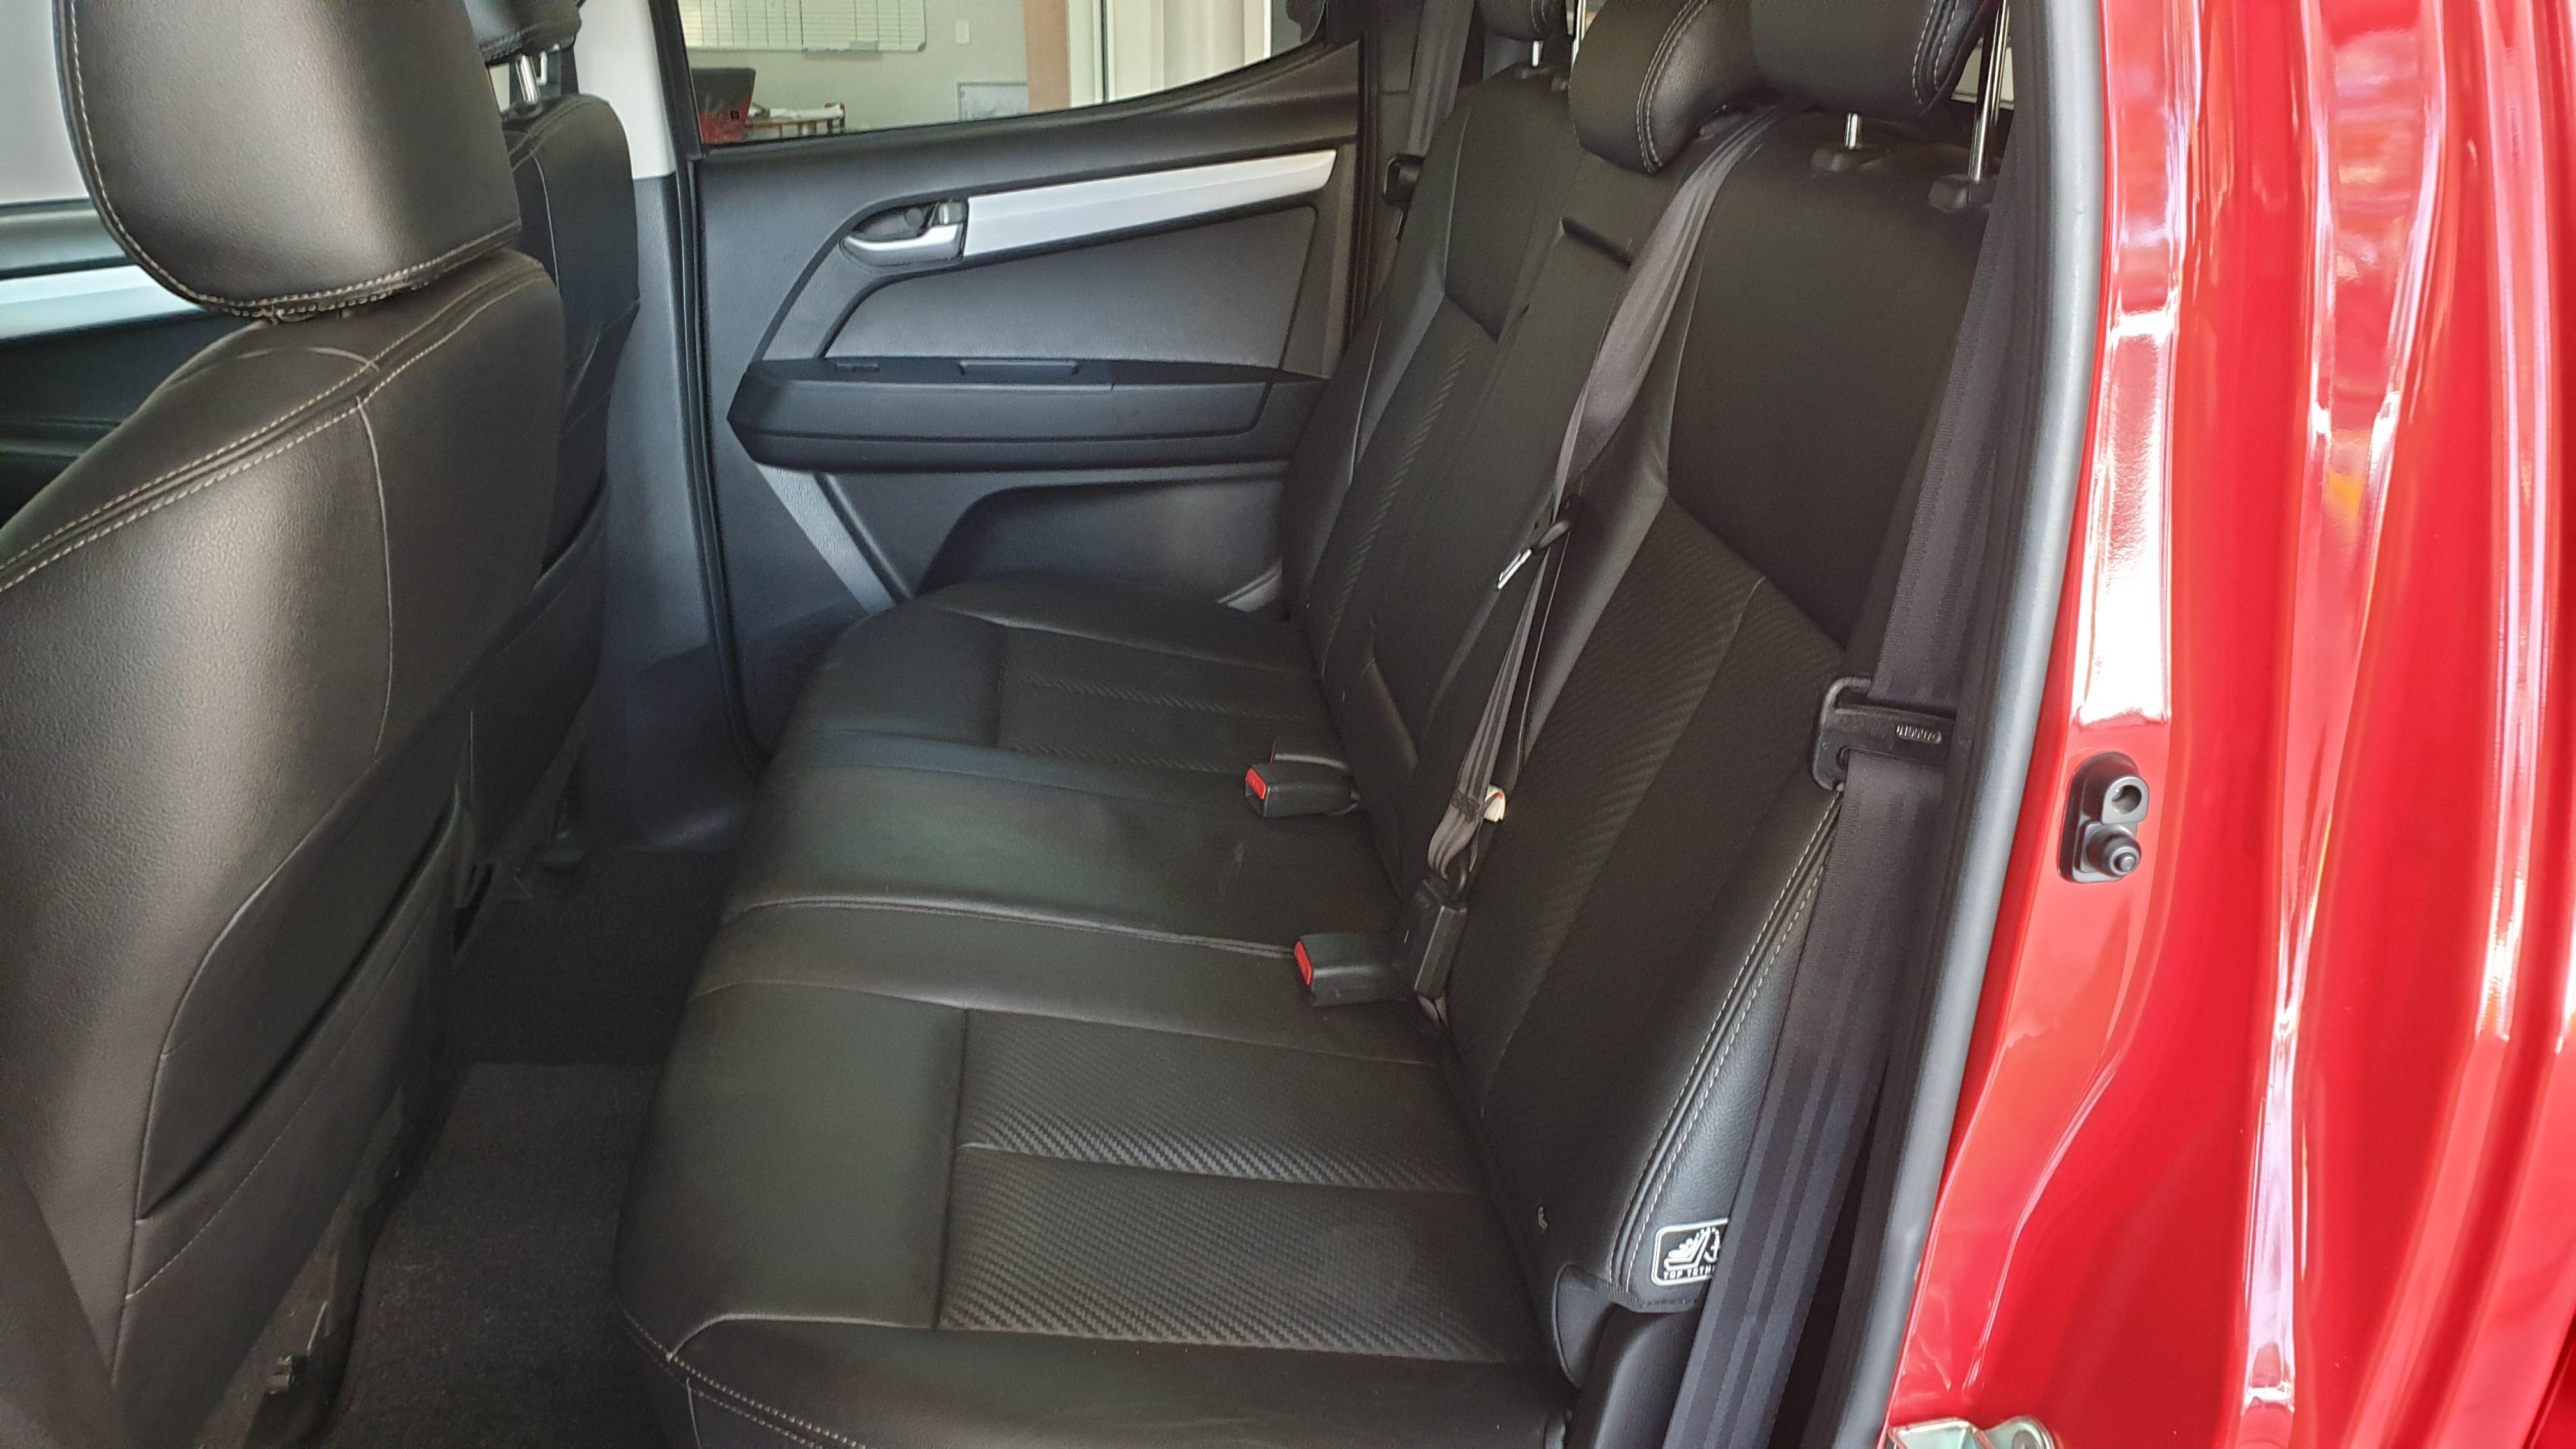 Isuzu KB Series 300 D-TEQ LX A/T 4X4 Double Cab Bakkie